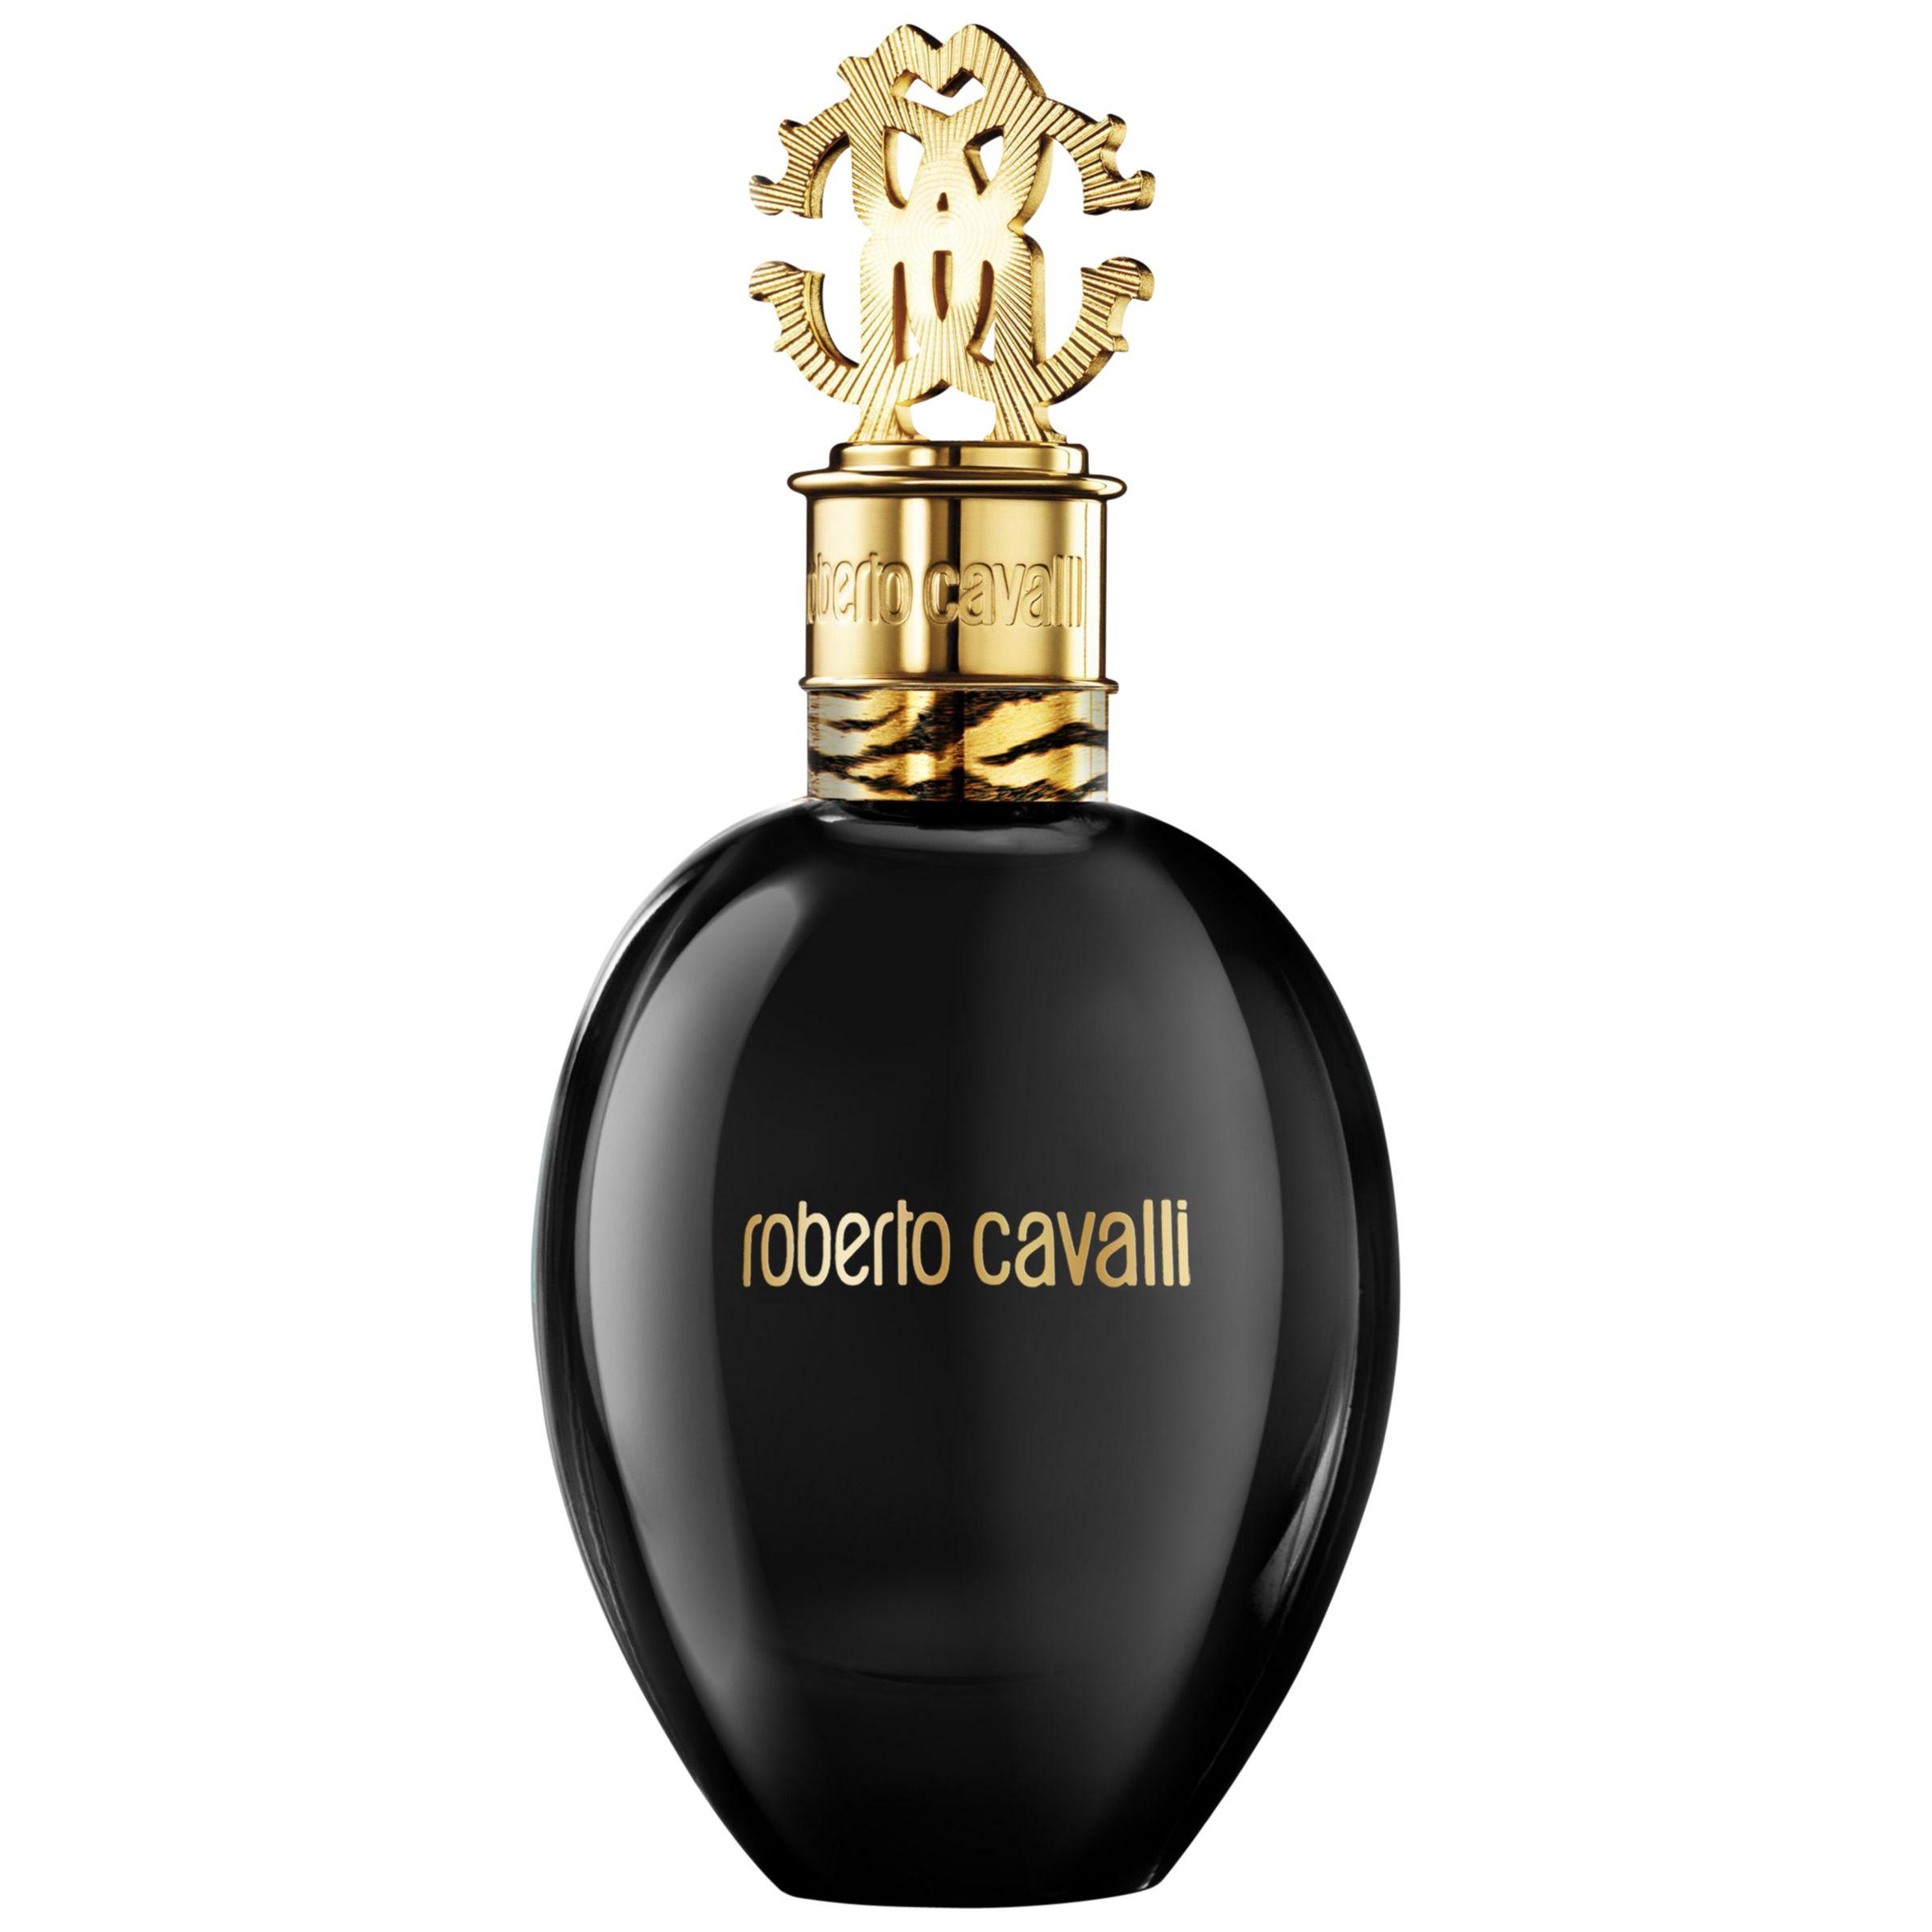 Roberto Cavalli Roberto Cavalli Nero Assoluto for Women Eau de Parfum